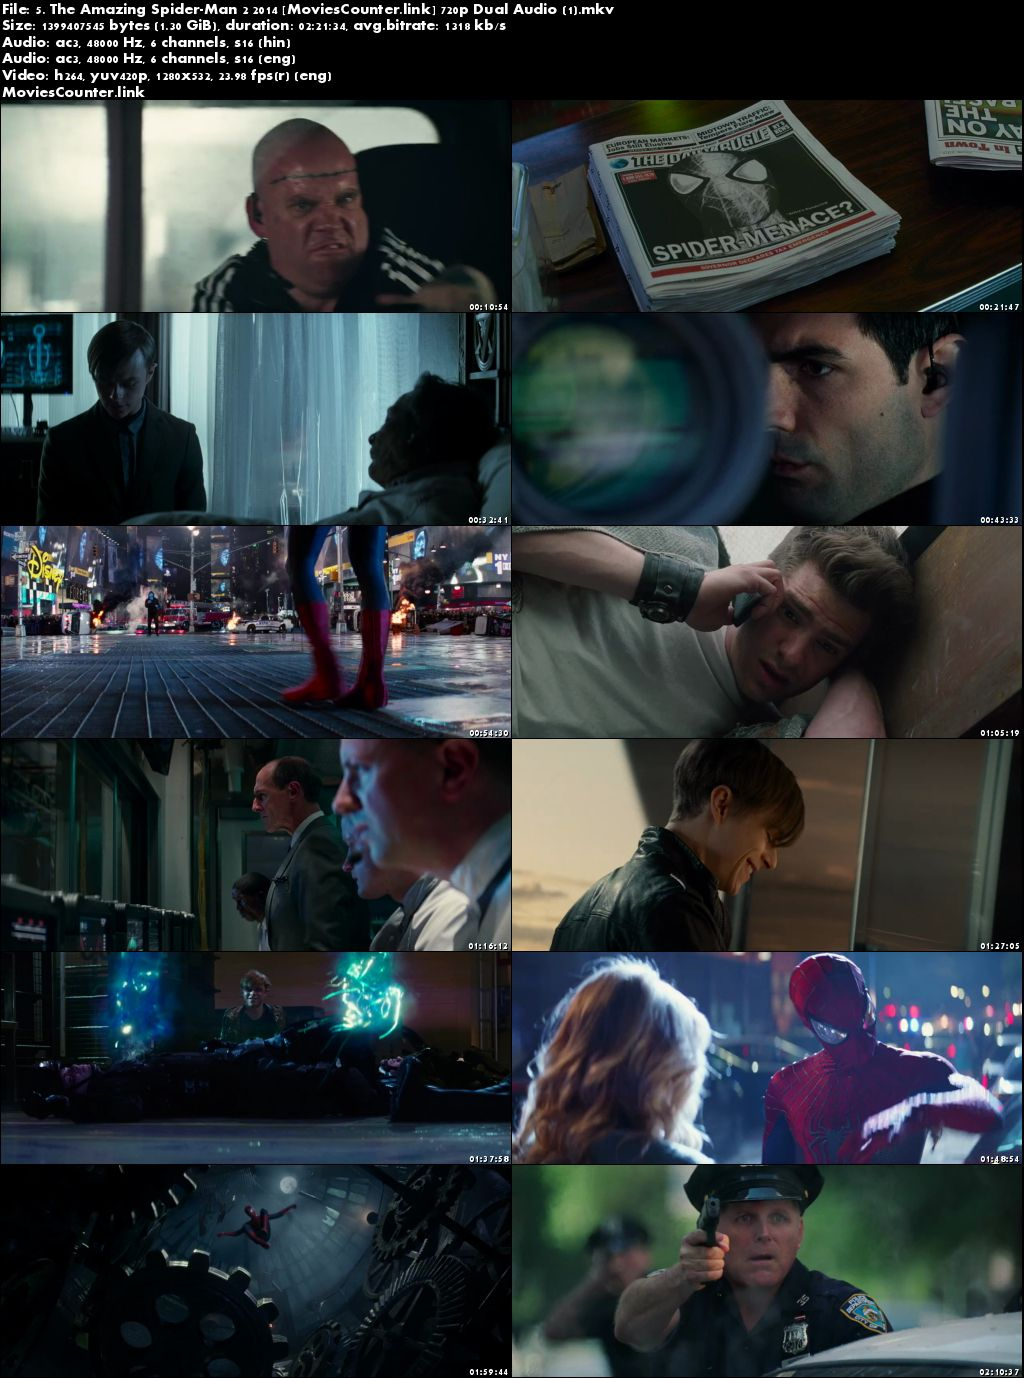 Screen Shot The Amazing Spider-Man 2 2014 Dual Audio HD 720p